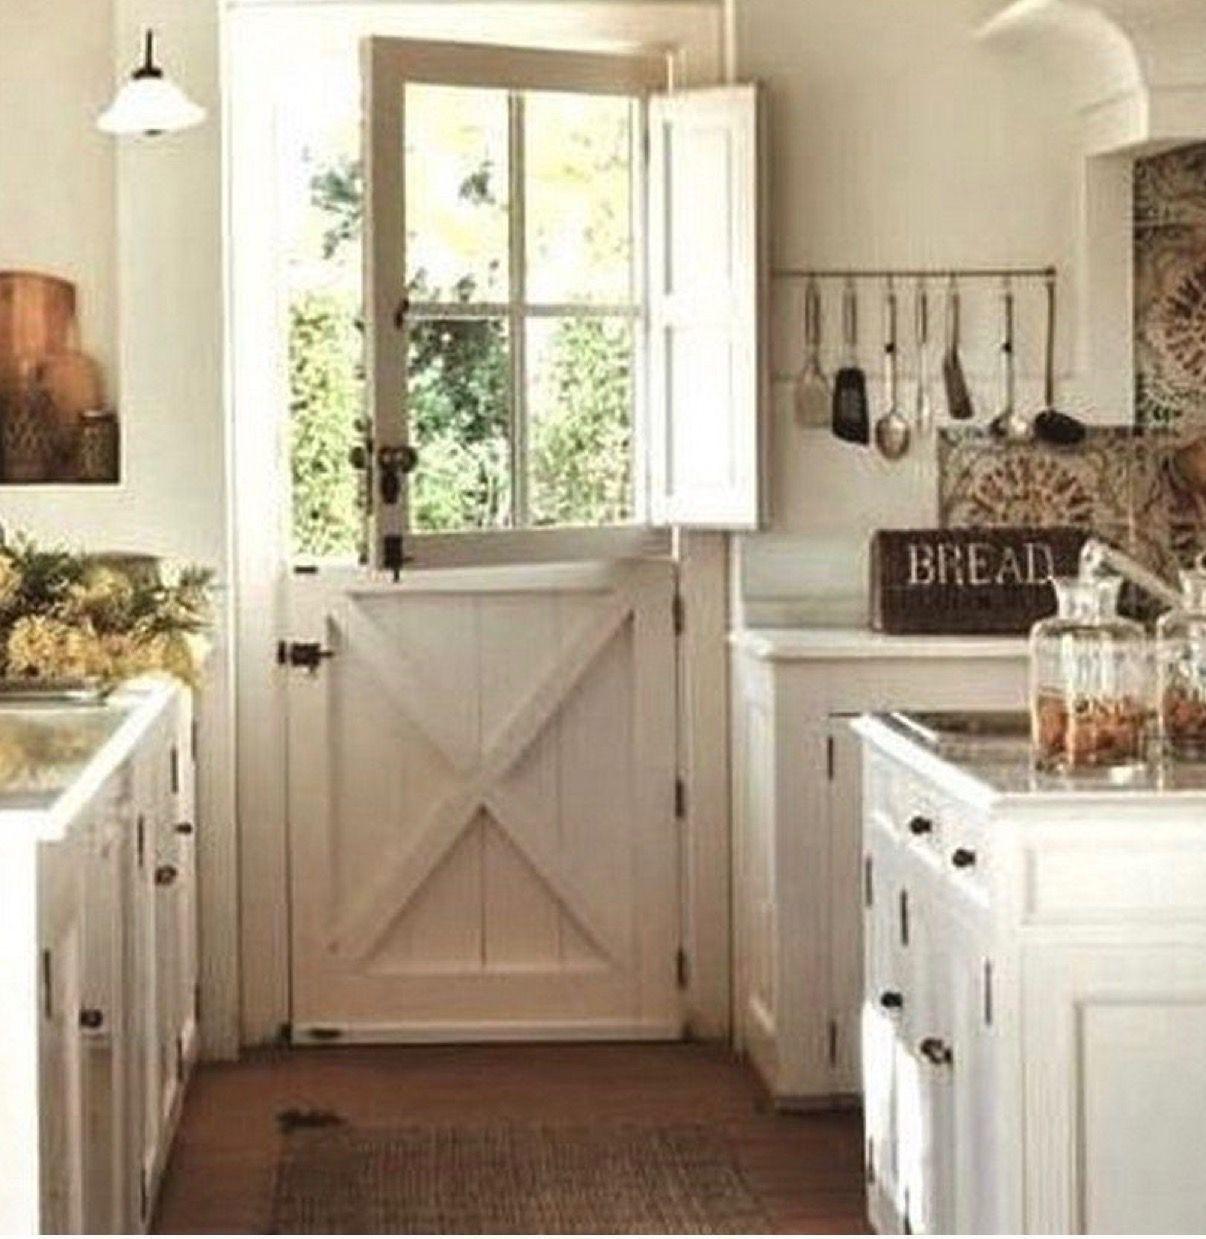 45+ IMPRESSIVE FARMHOUSE COUNTRY KITCHEN DECOR IDEAS – Home Decor Ideas